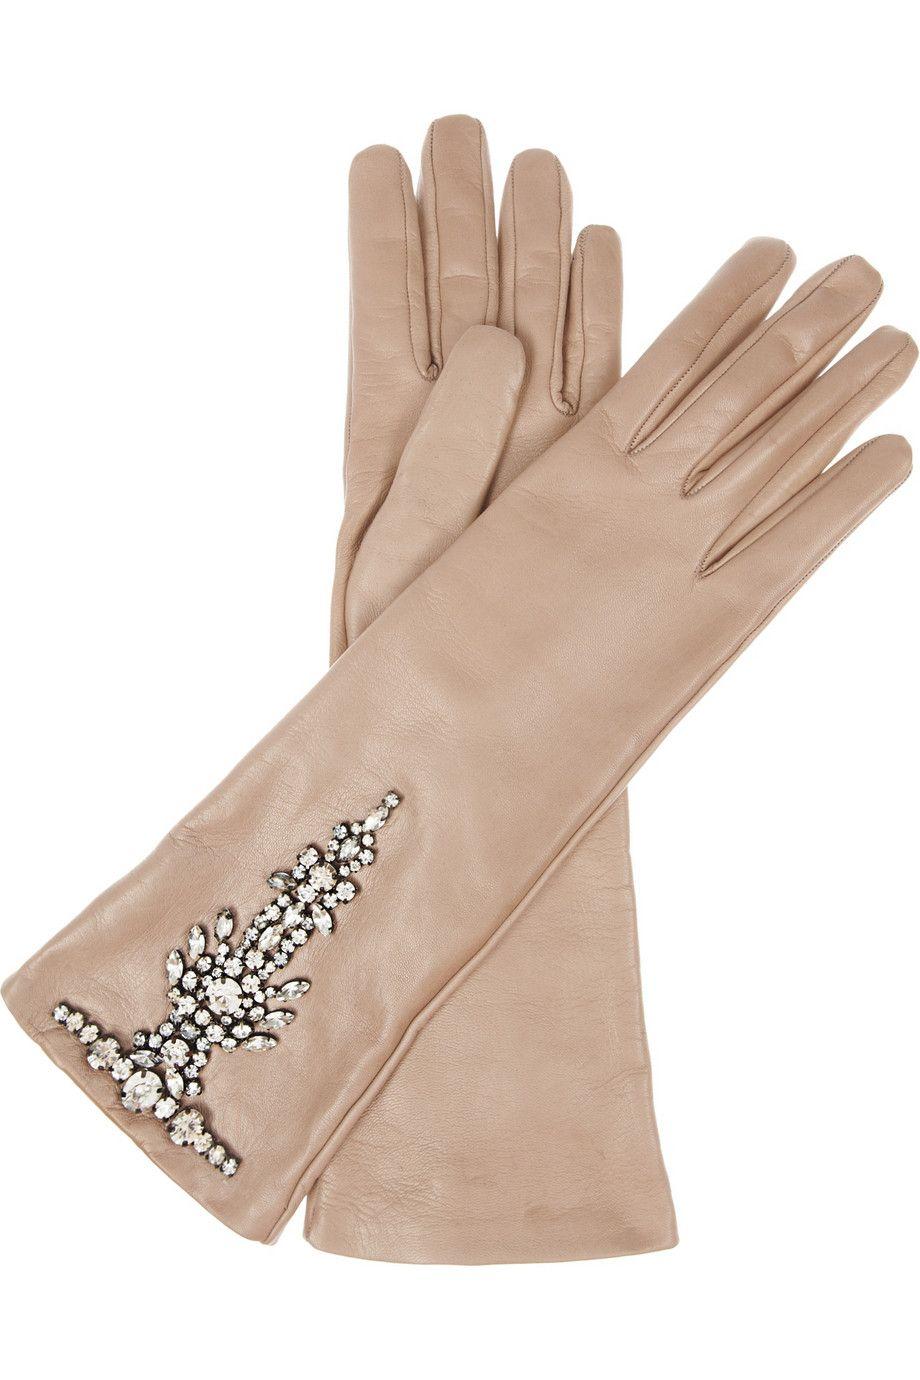 Evening-Gloves-1302